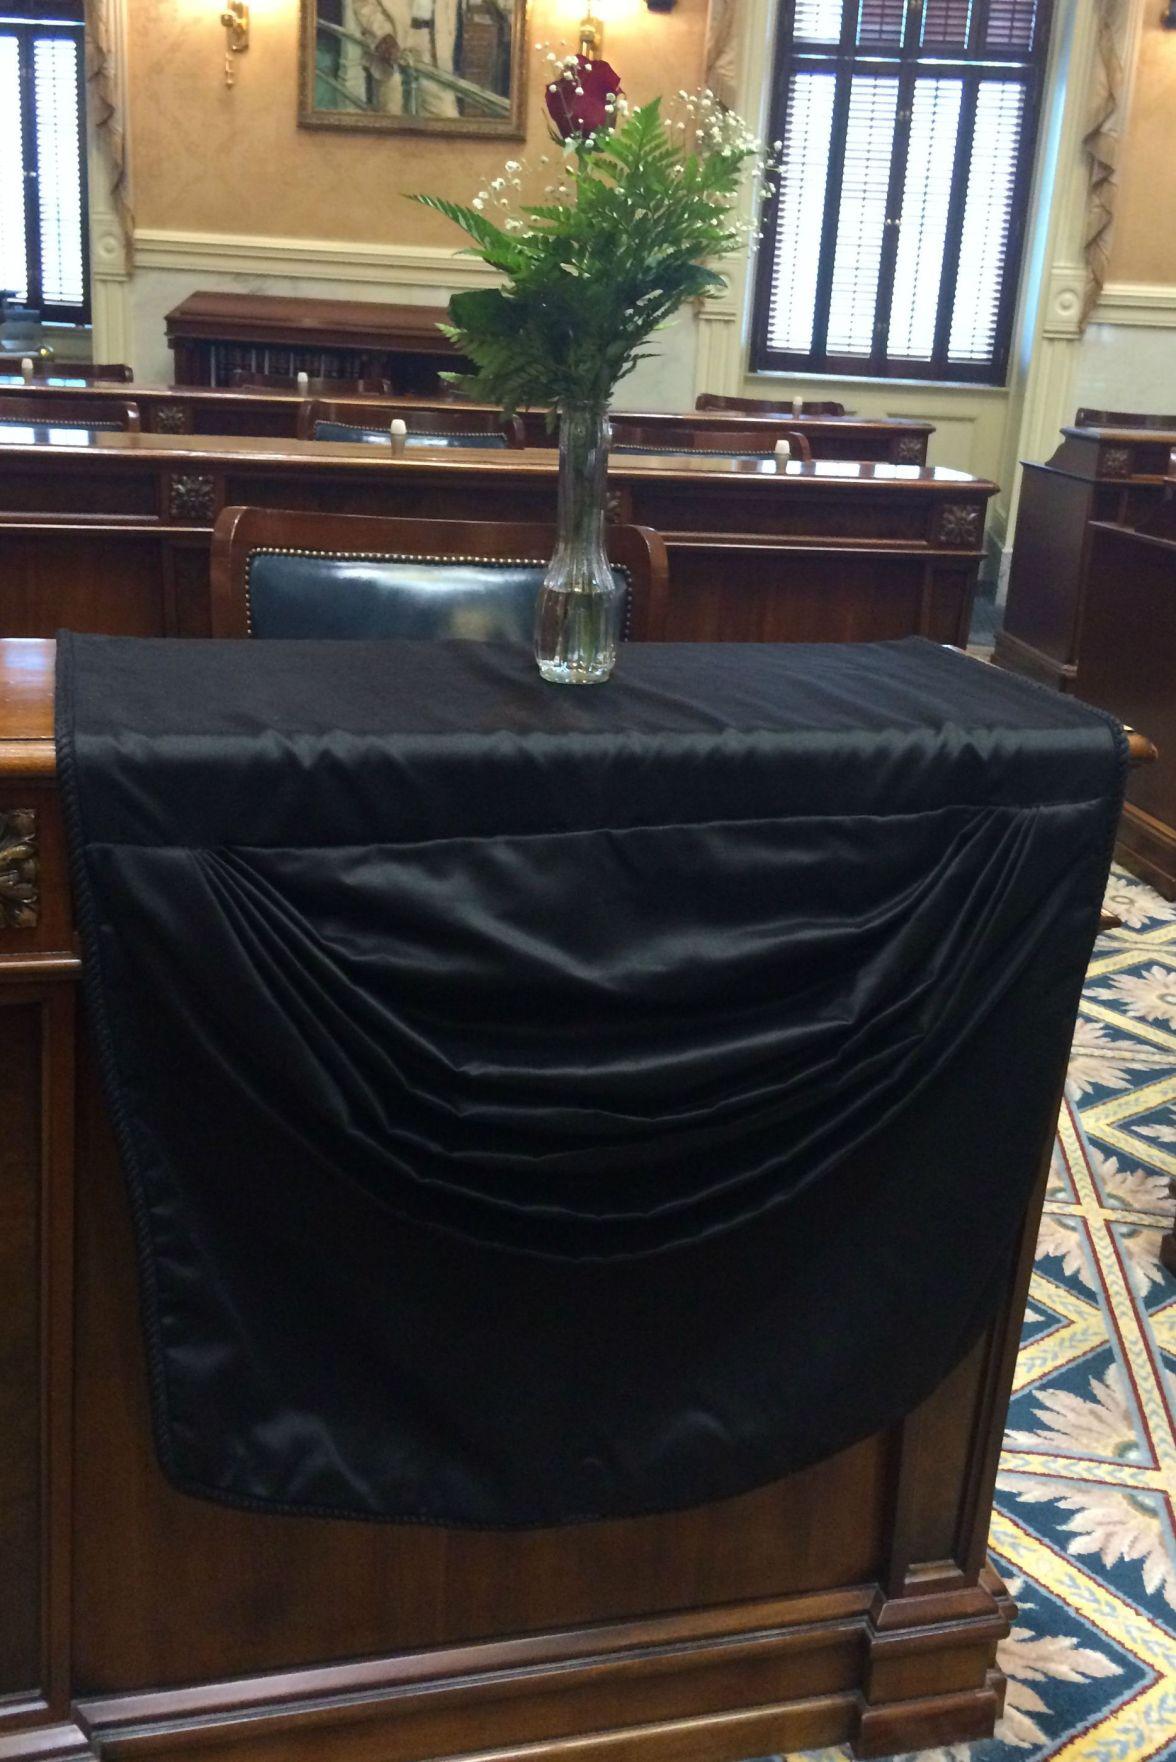 Palmetto Sunrise: Legislature to tackle removal of Confederate battle flag